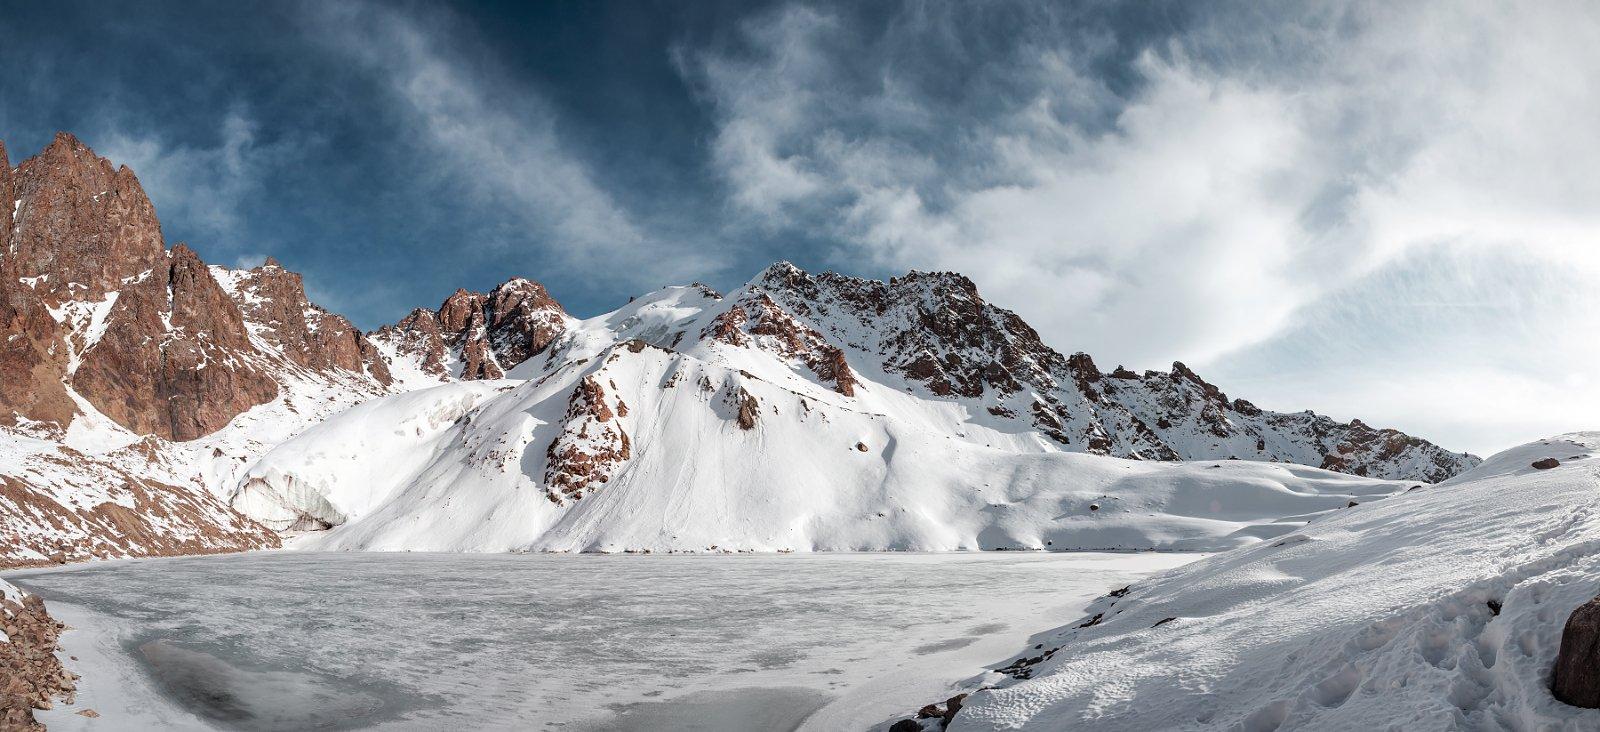 Almaty, Clouds, Glacier, Ice, Lake, Landscape, Mountain, Nature, Rocks, Sky, Snow, Winter, Anton Akhmatov